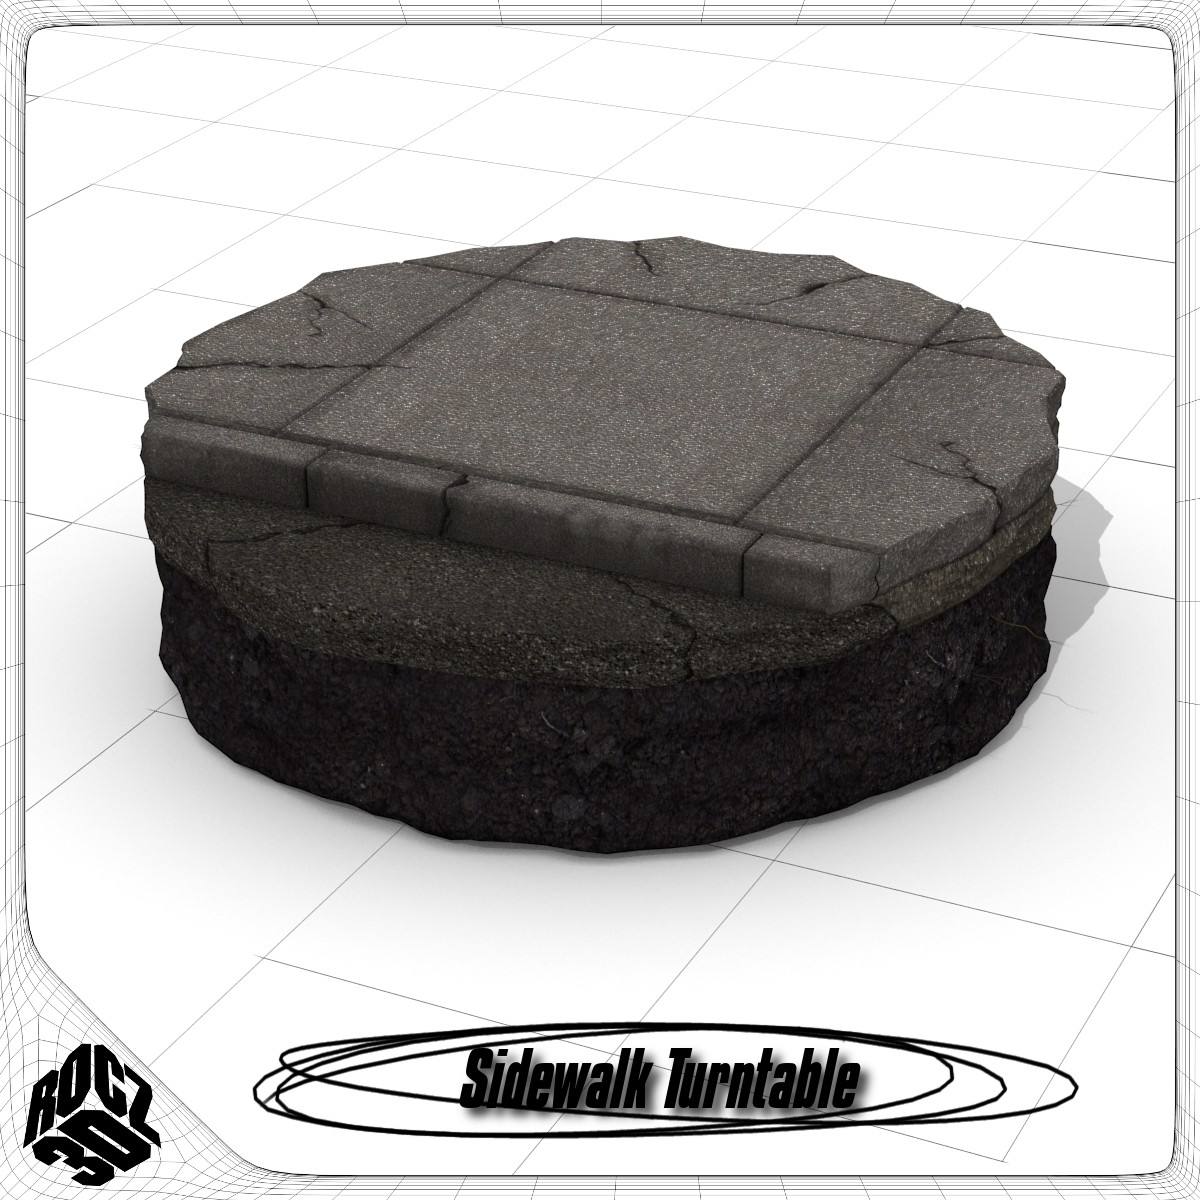 Sidewalk Turntable_3d Model_Textured.jpg